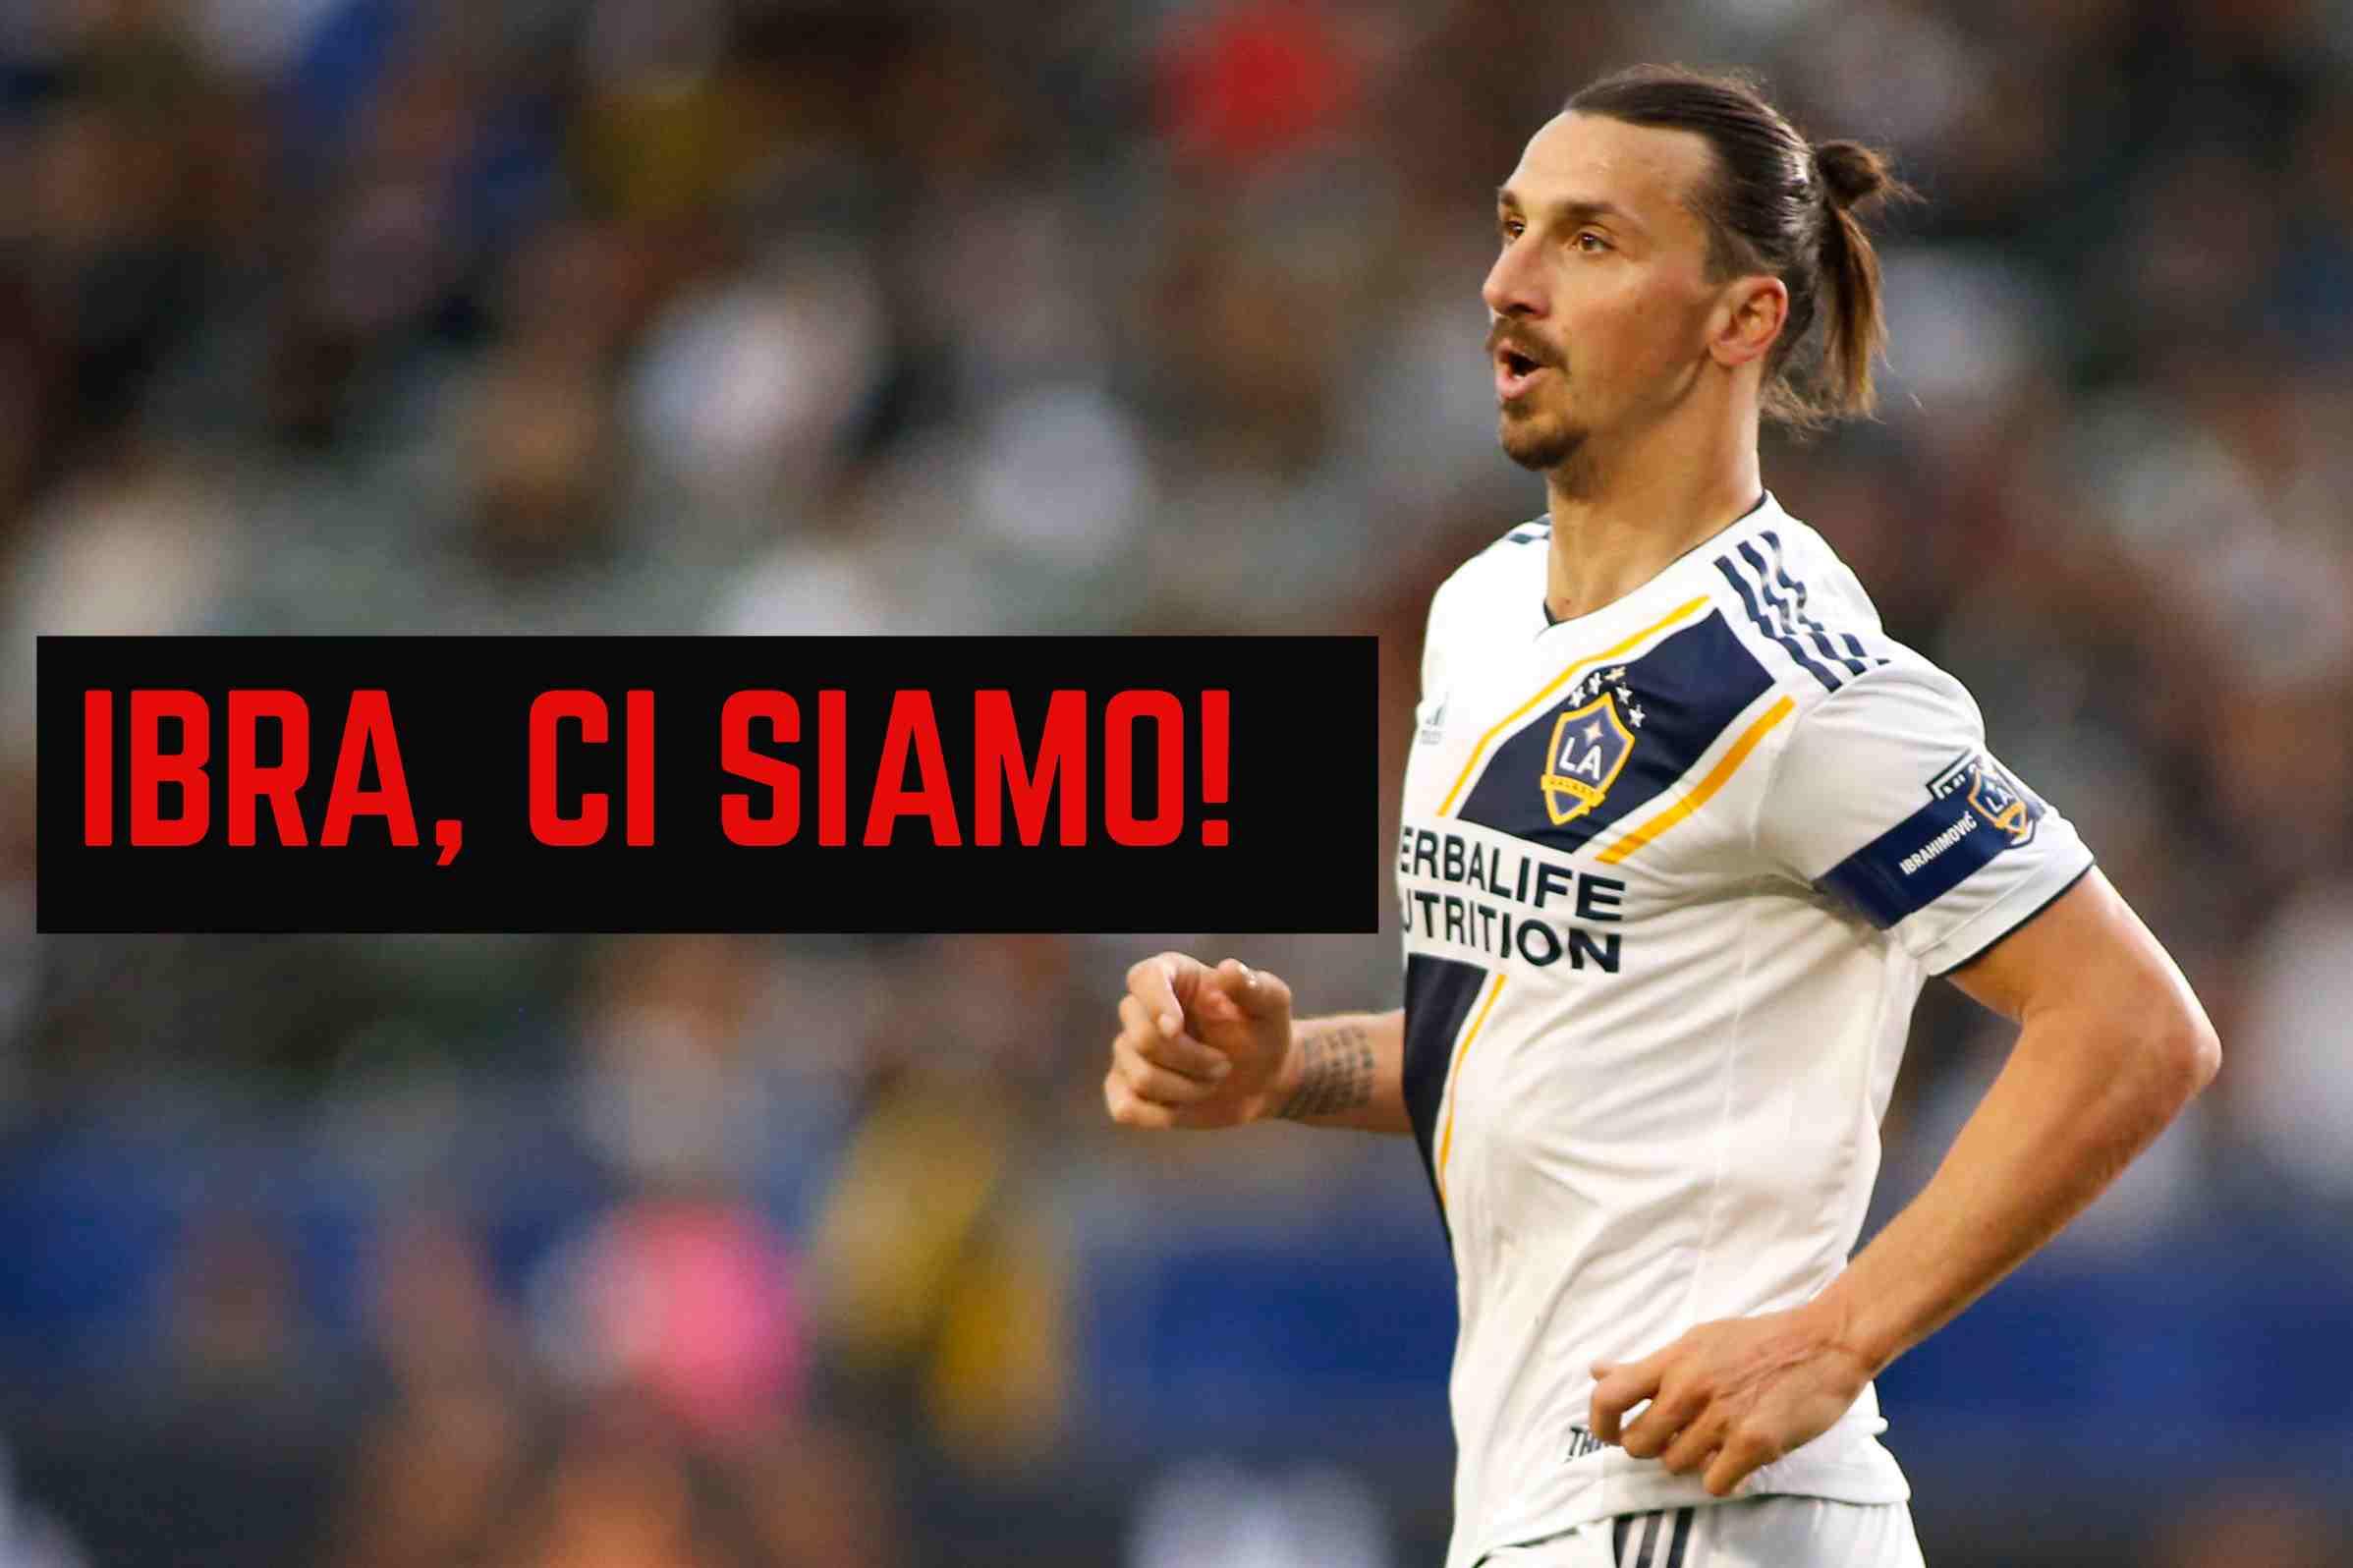 Calciomercato Milan Summit Per Ibrahimovic Le Ultimissime